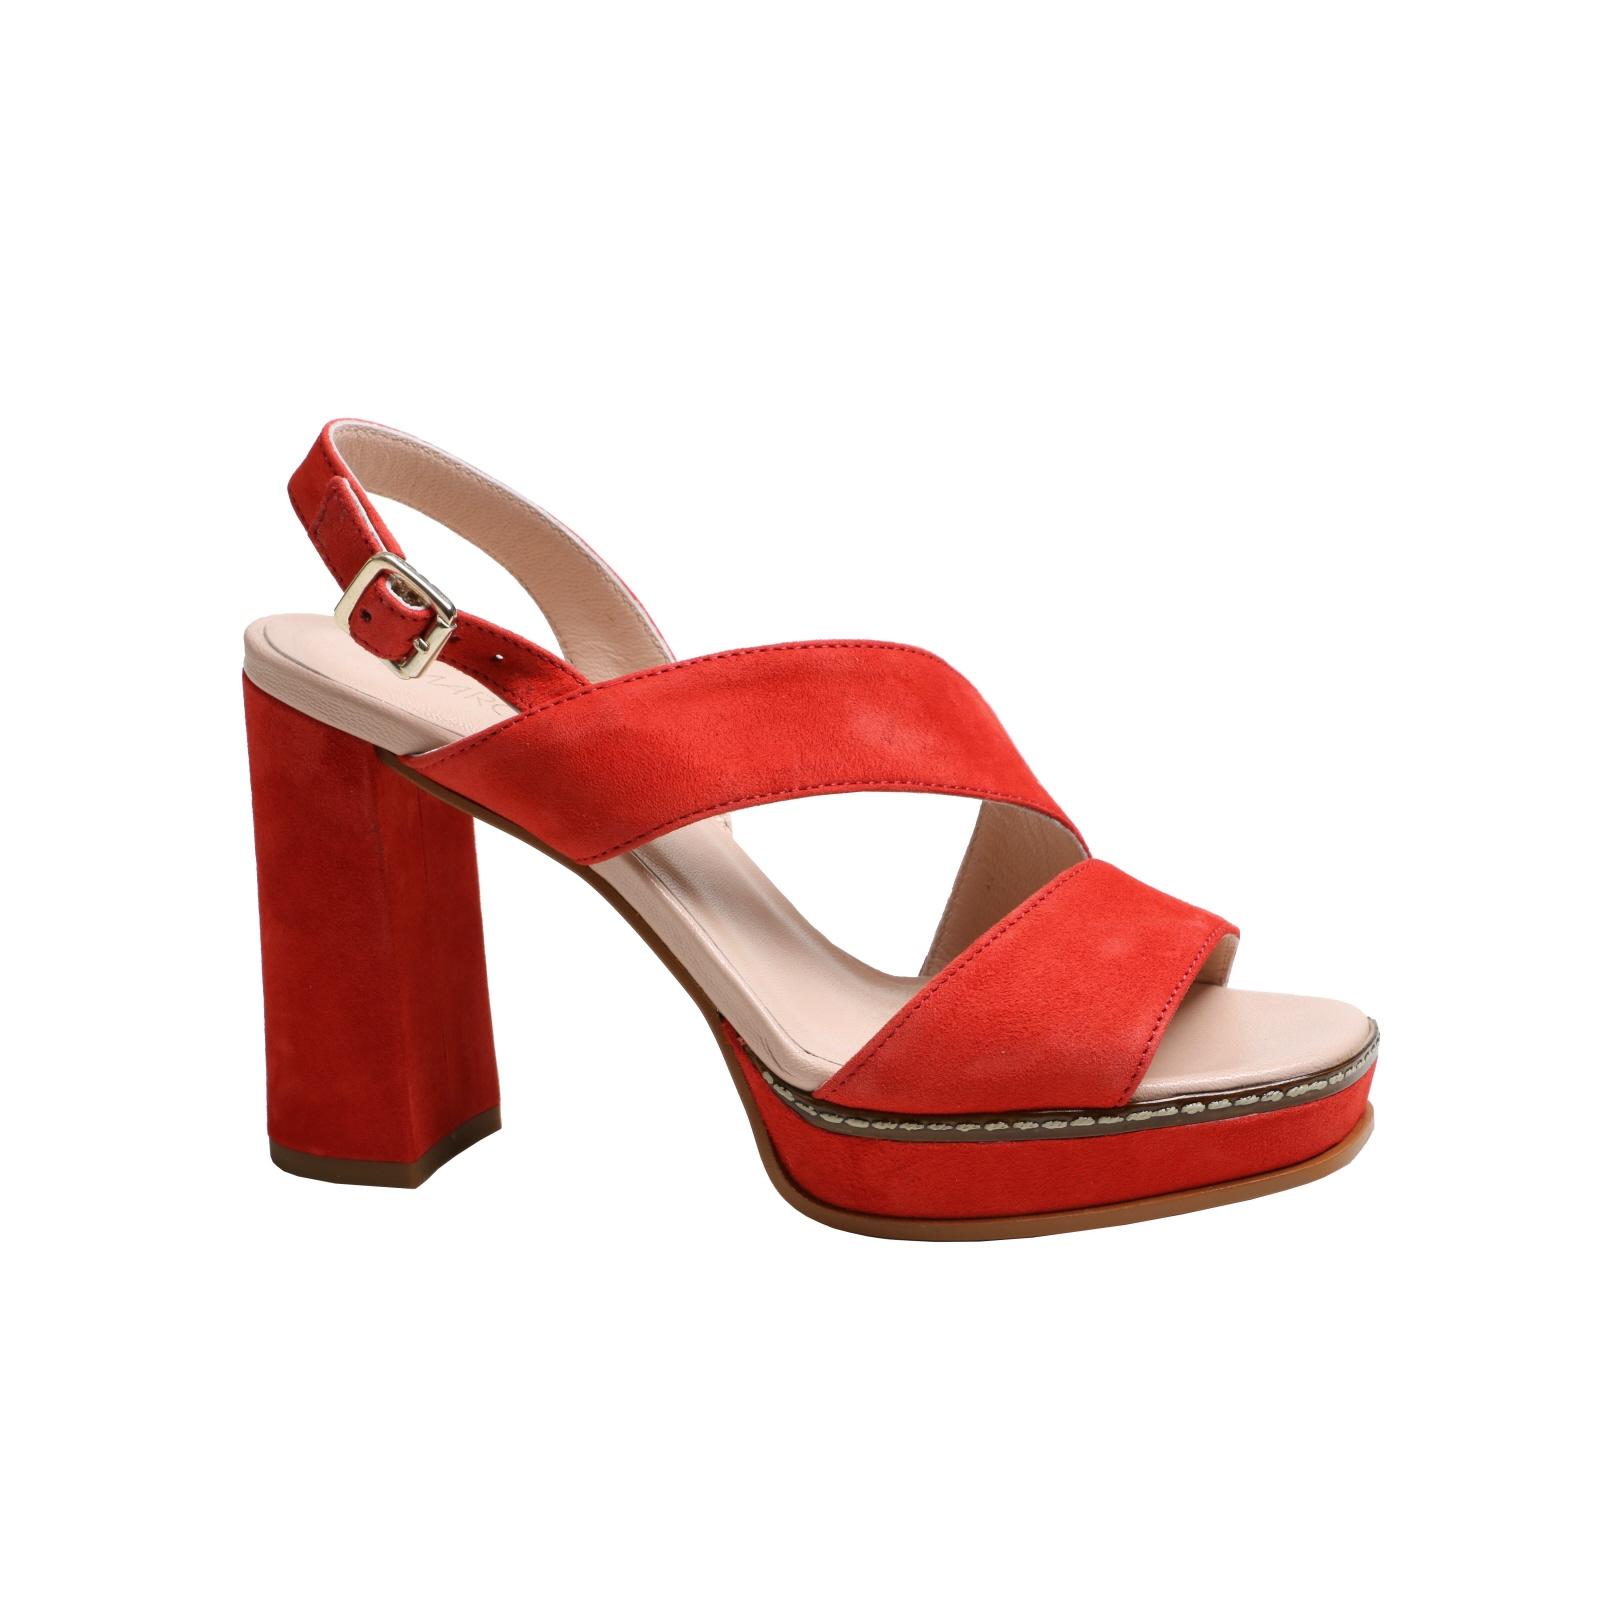 Womens Sandals MARCCAIN Fashion Red Davison New Size 39